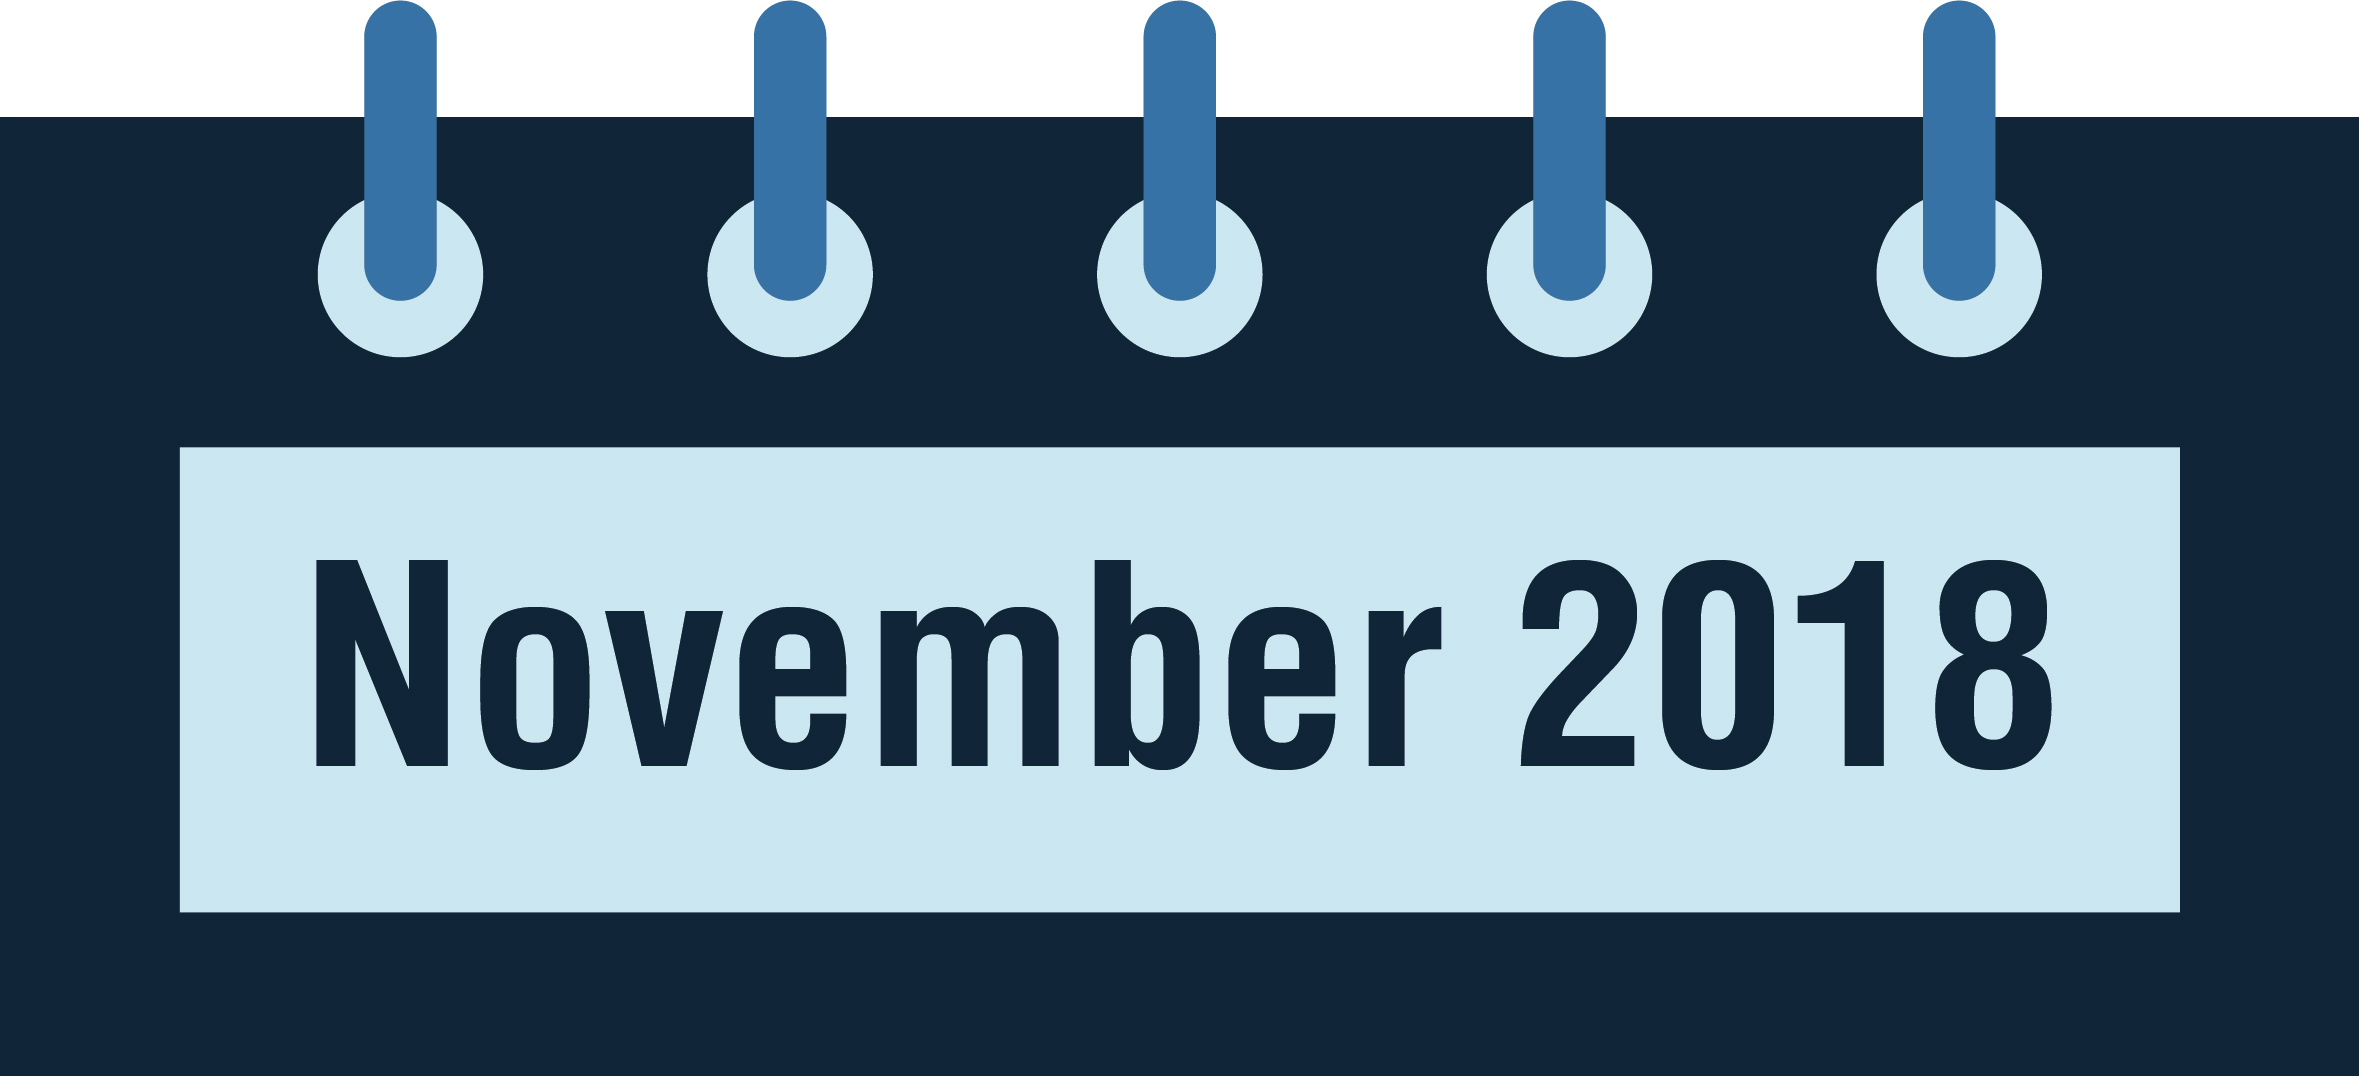 NeuroCheck History - November 2018 (Image © NeuroCheck)